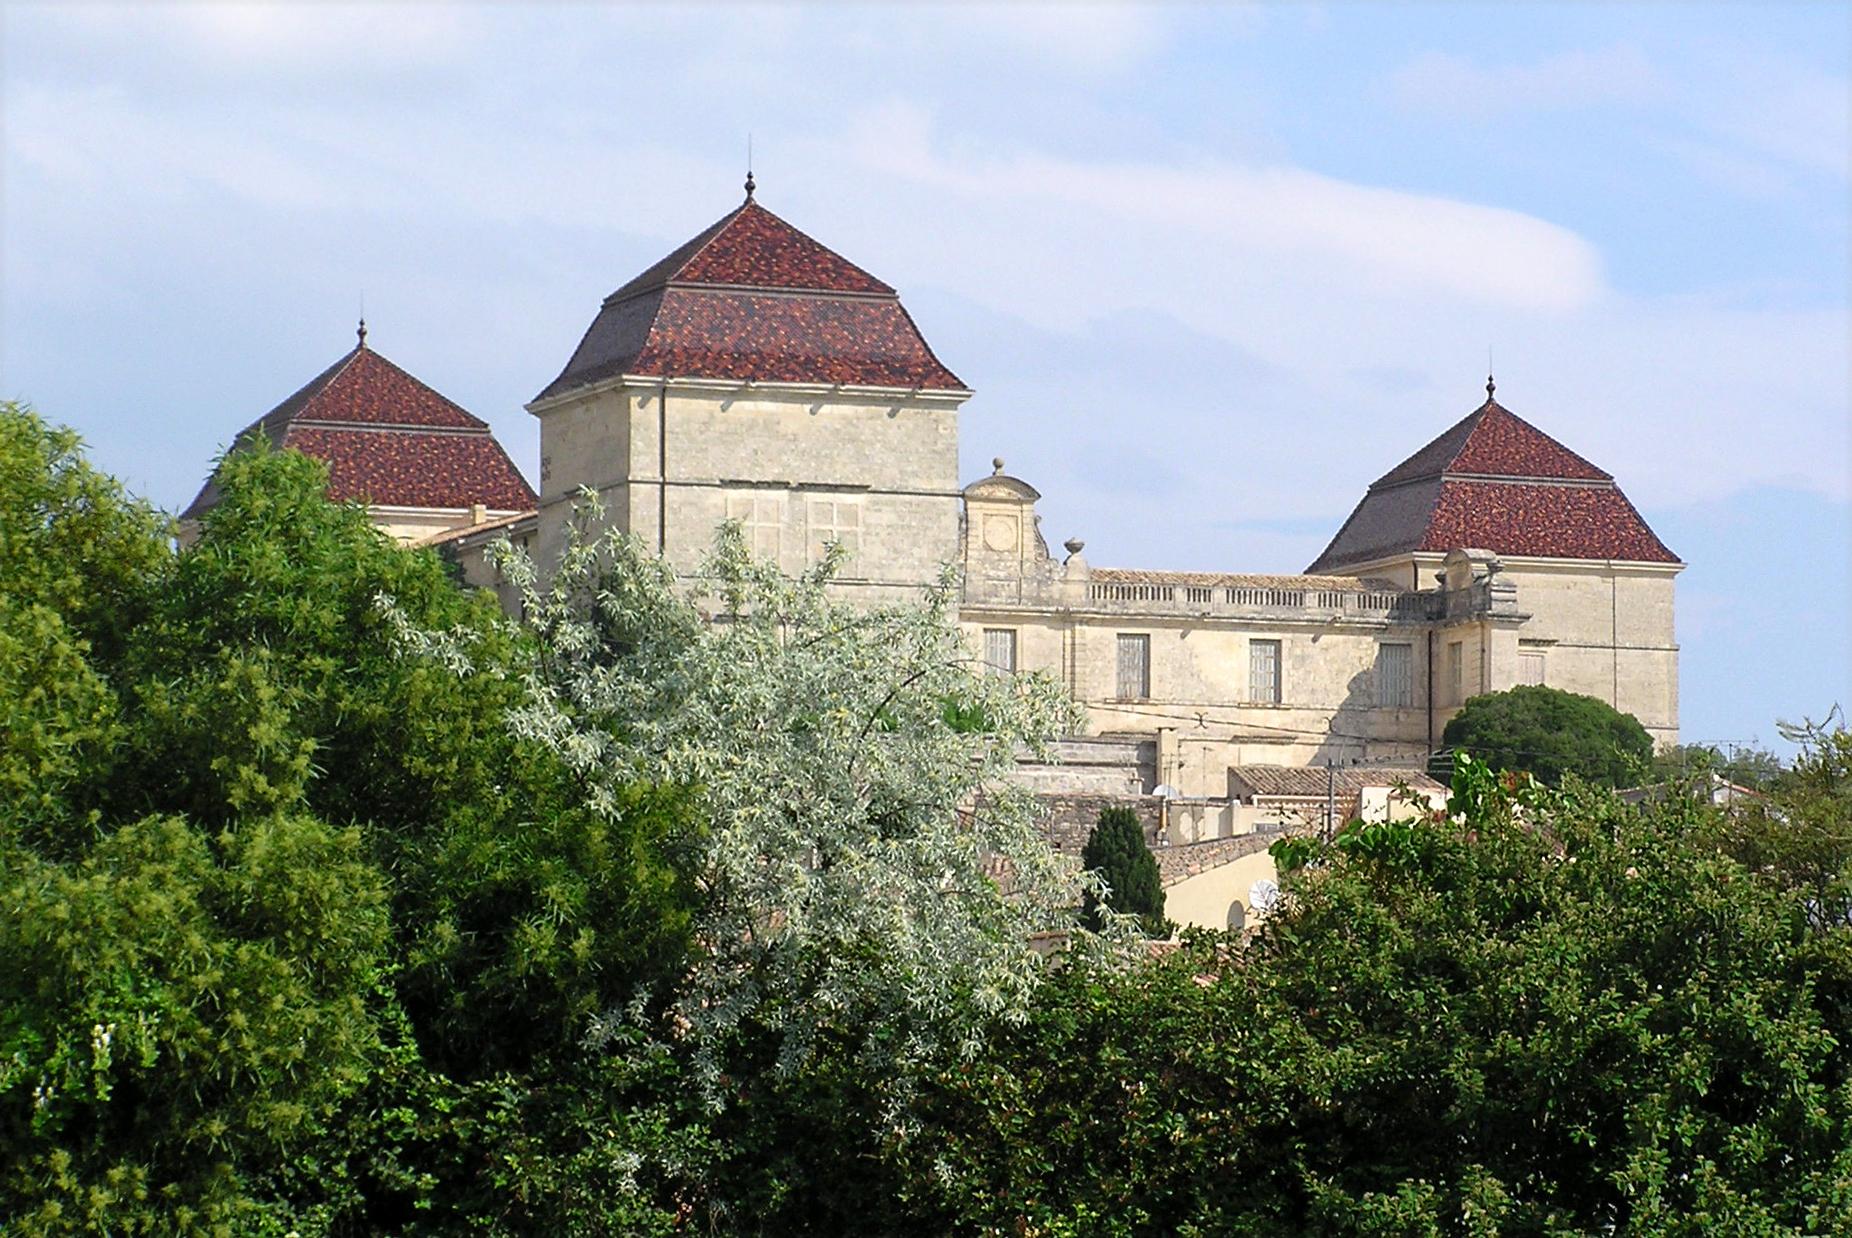 Castries France  City pictures : Chateau de Castries2 Wikimedia Commons